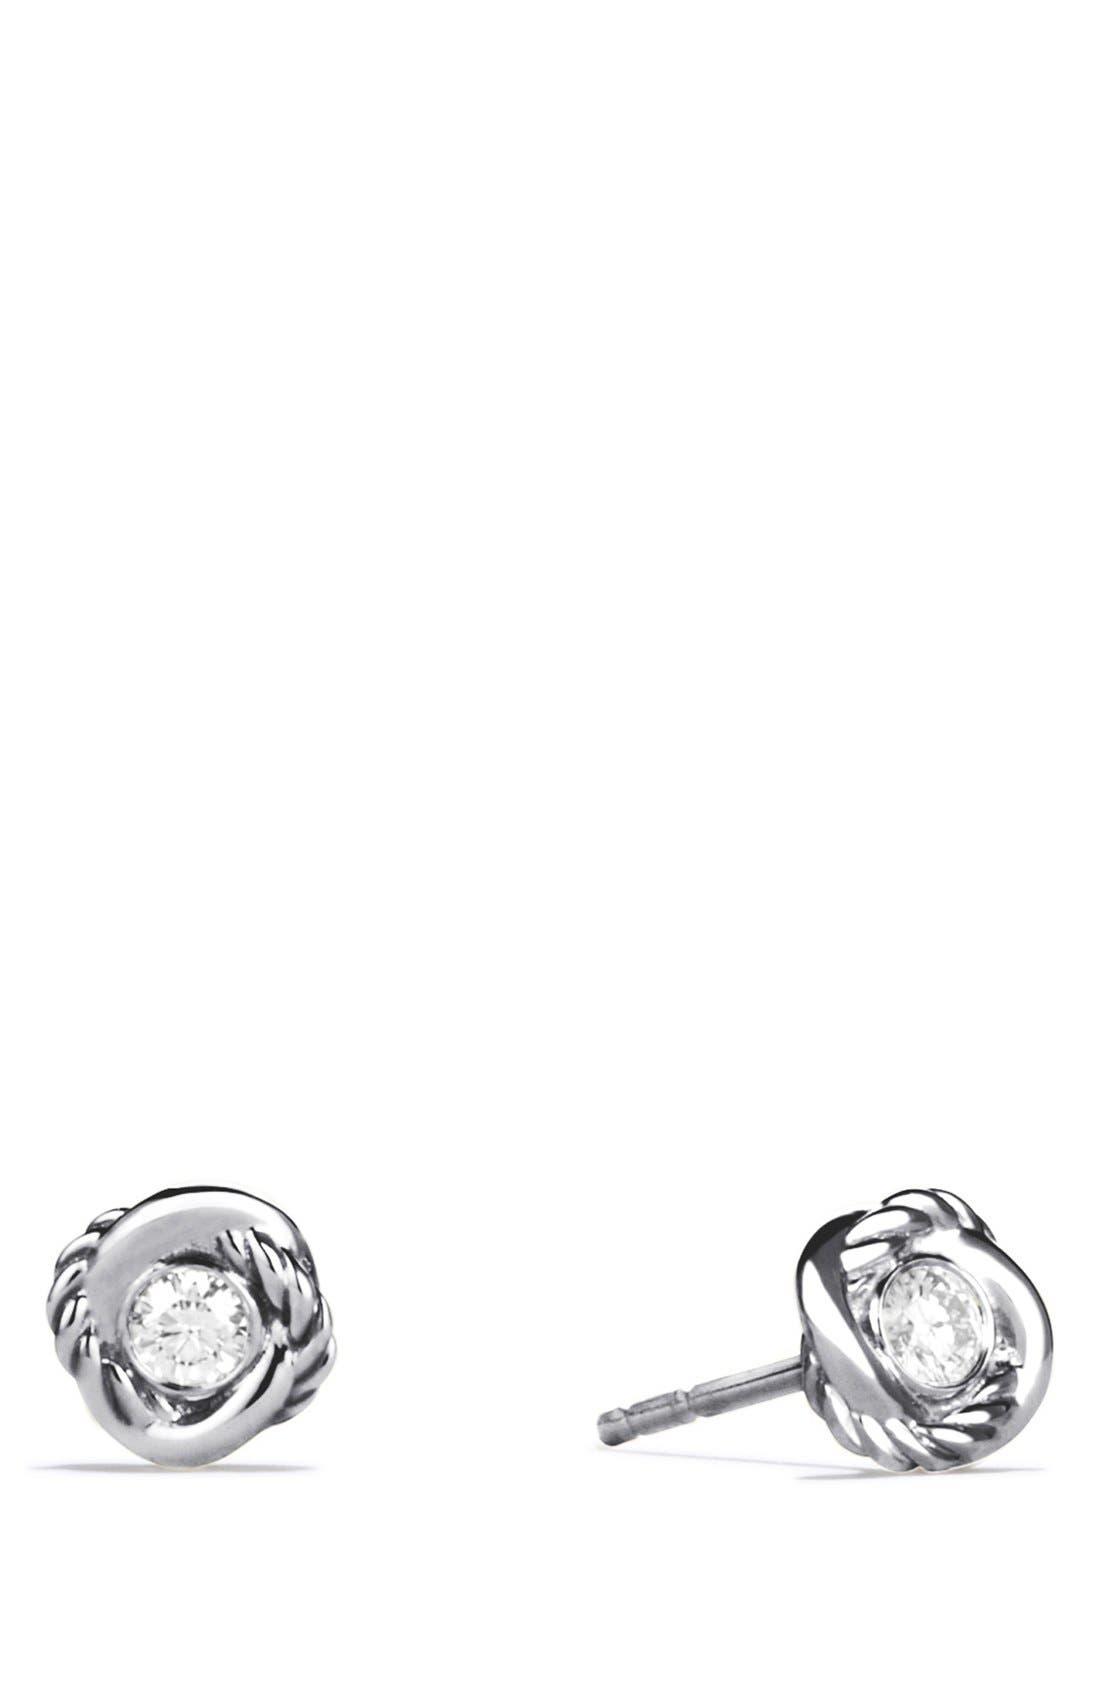 DAVID YURMAN 'Infinity' Earrings with Diamonds, Main, color, DIAMOND